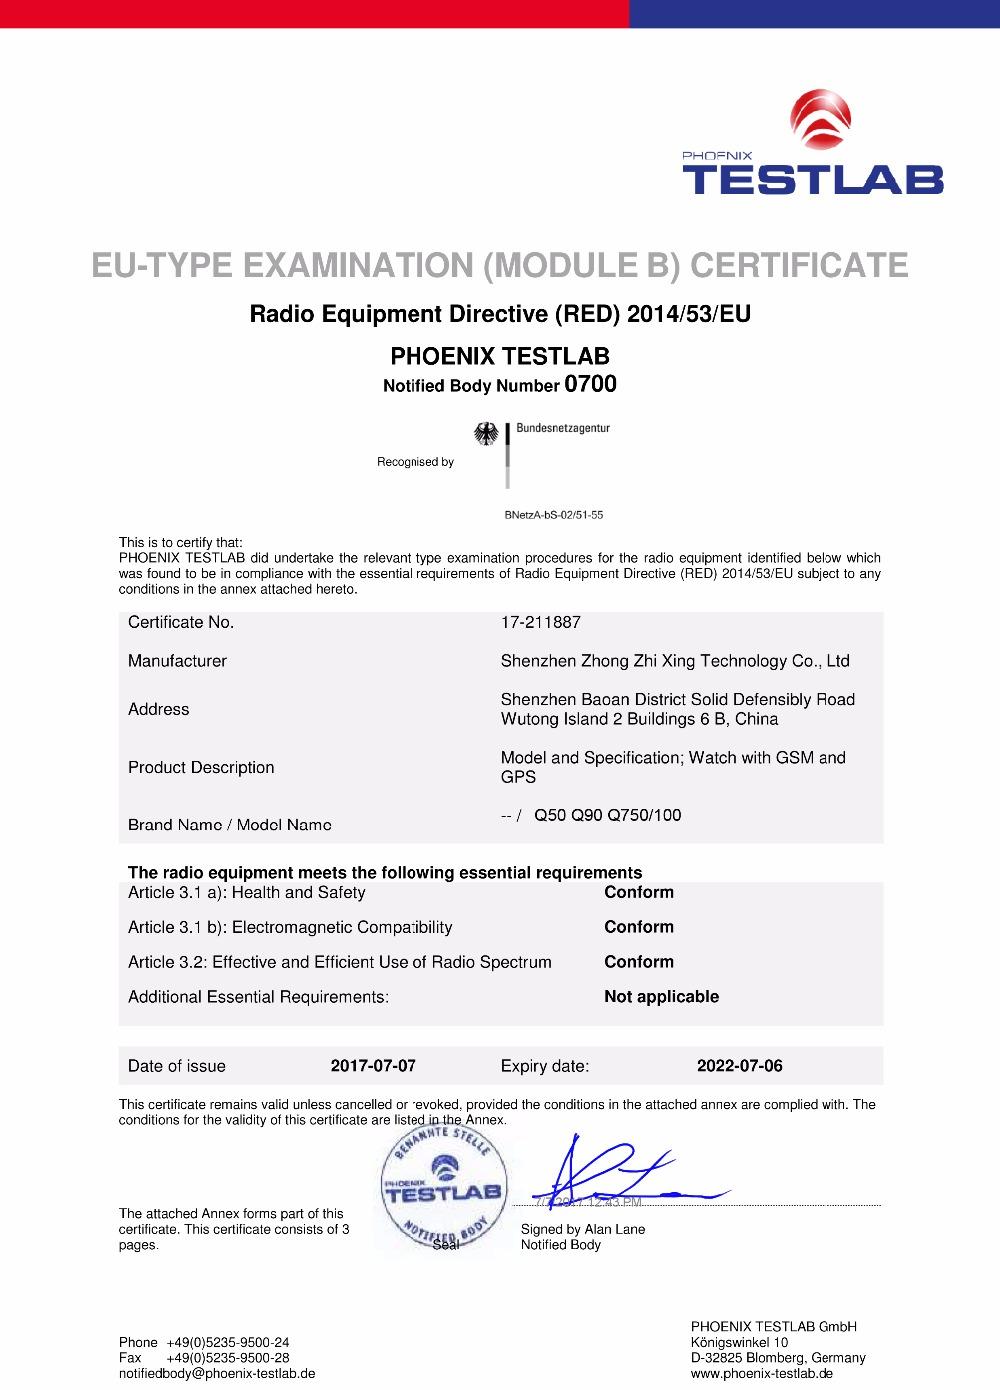 17-211887_RED Certificate_M05-1